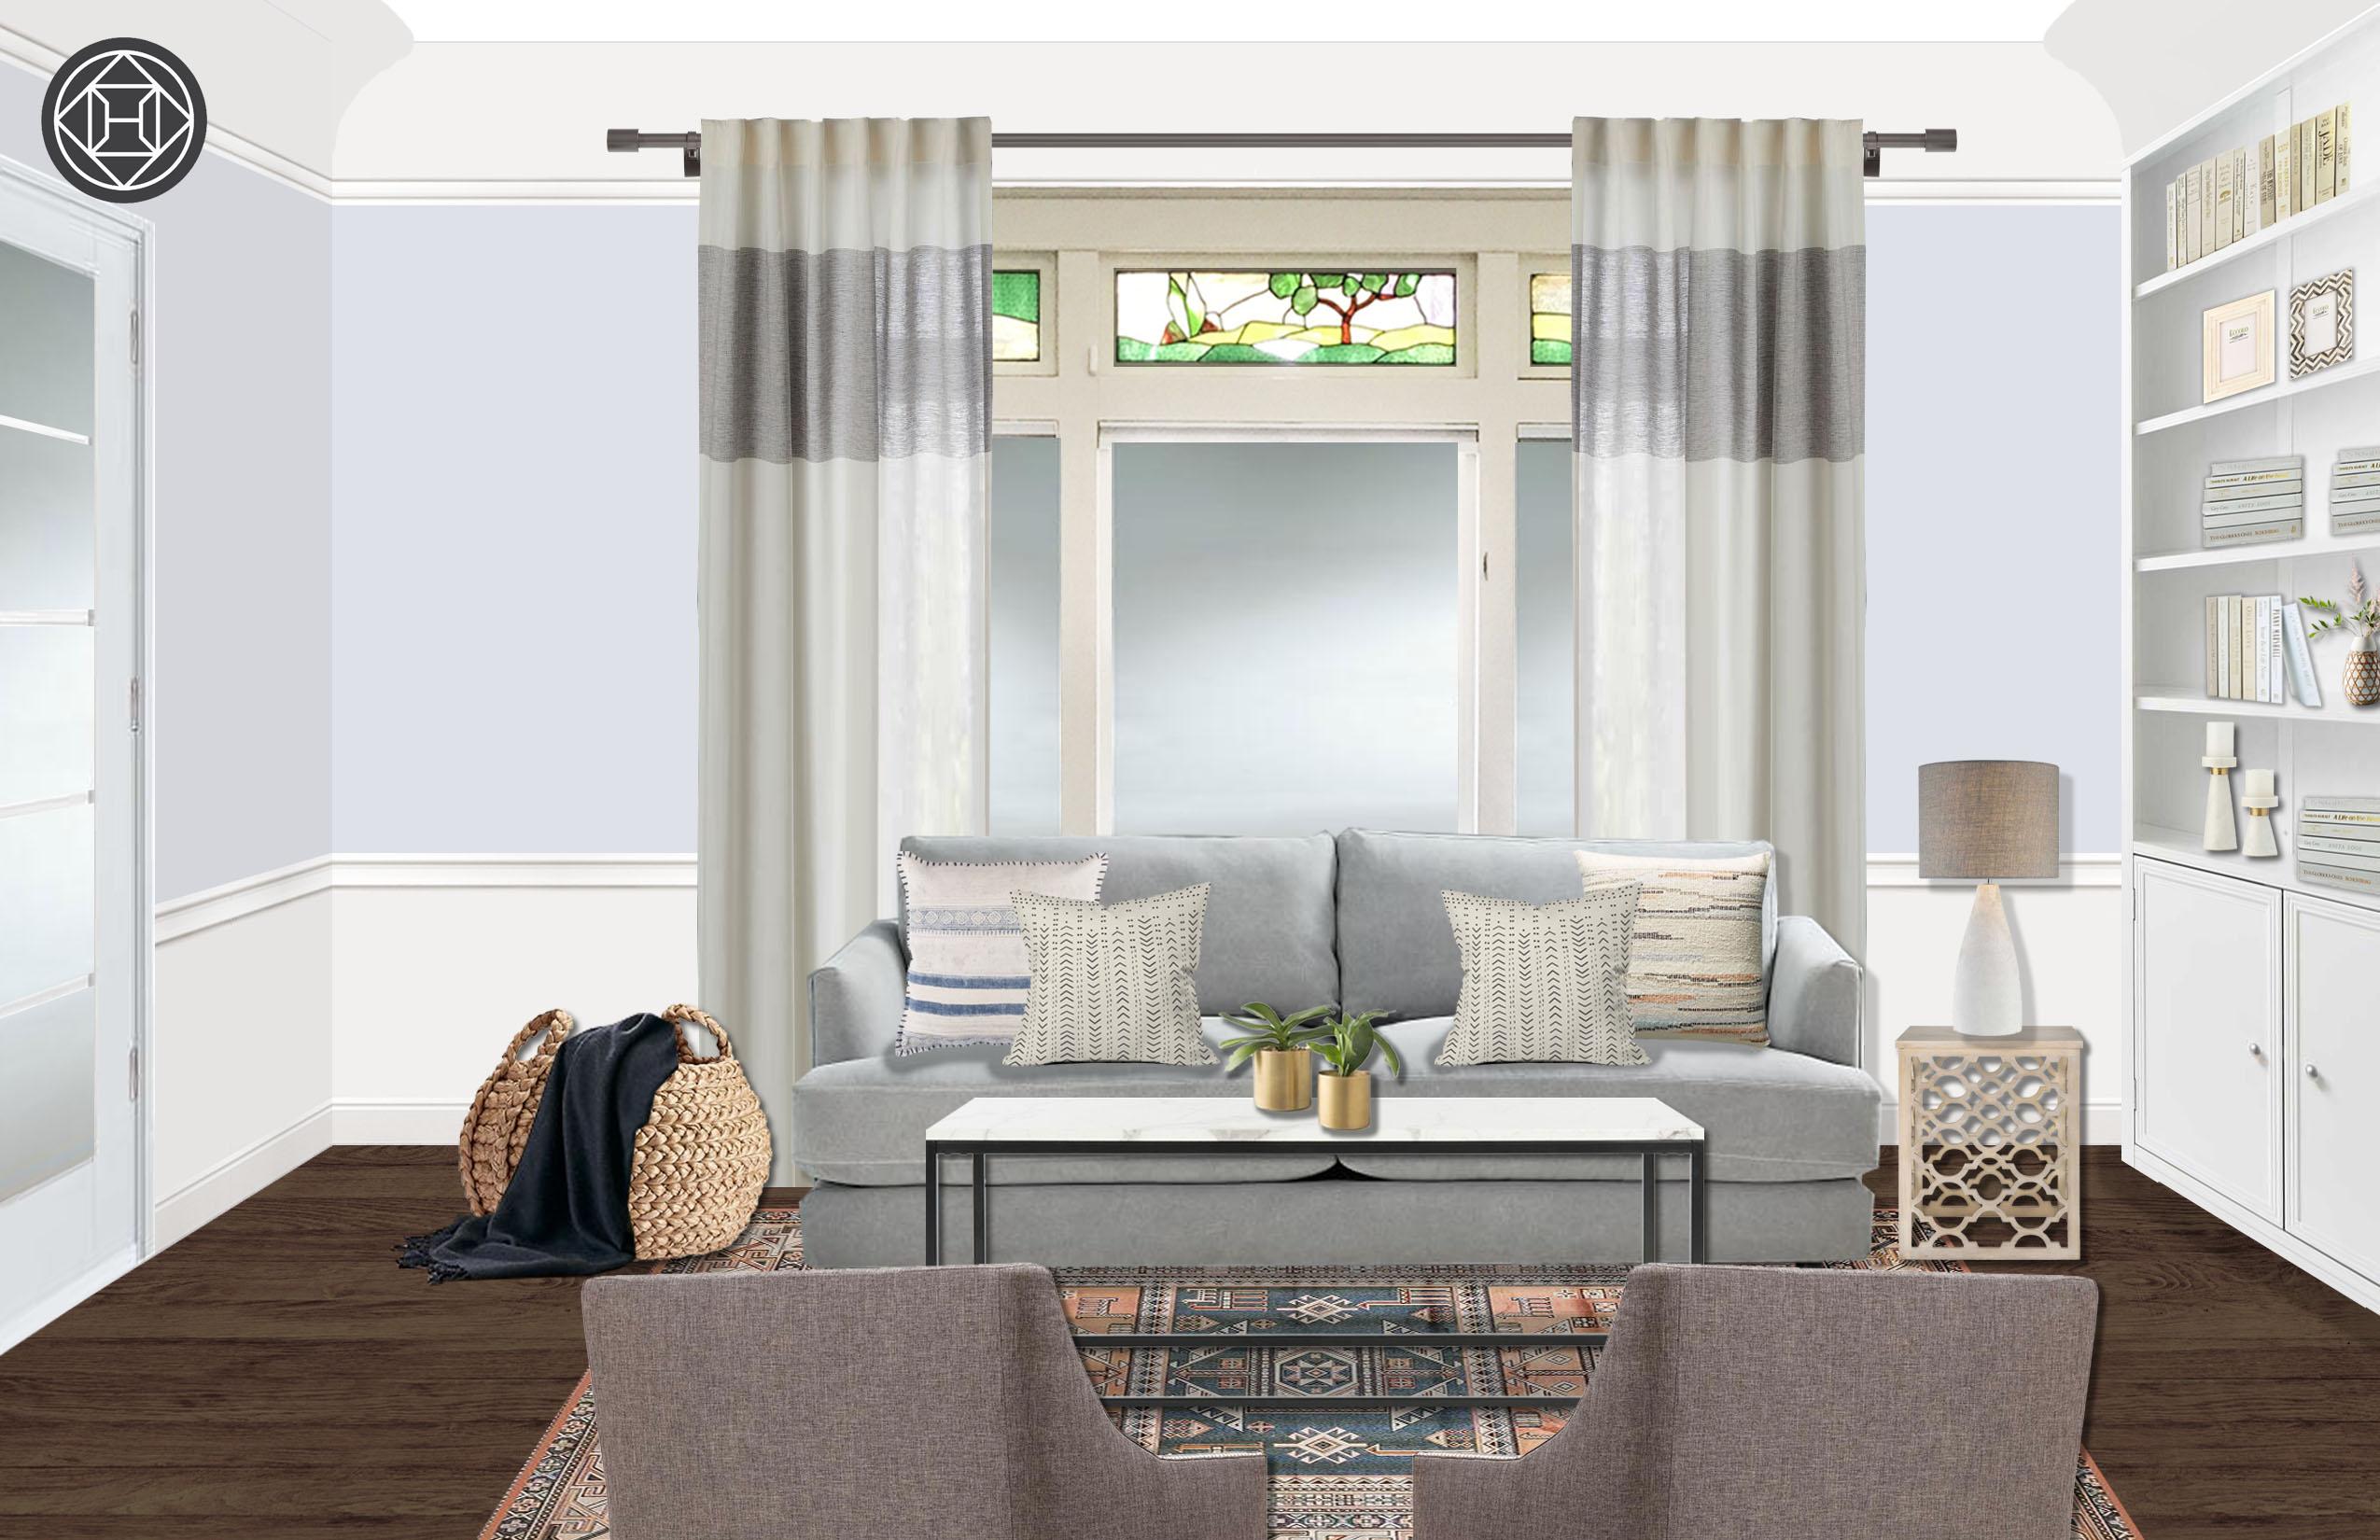 Stine Rypestol Interior Designer